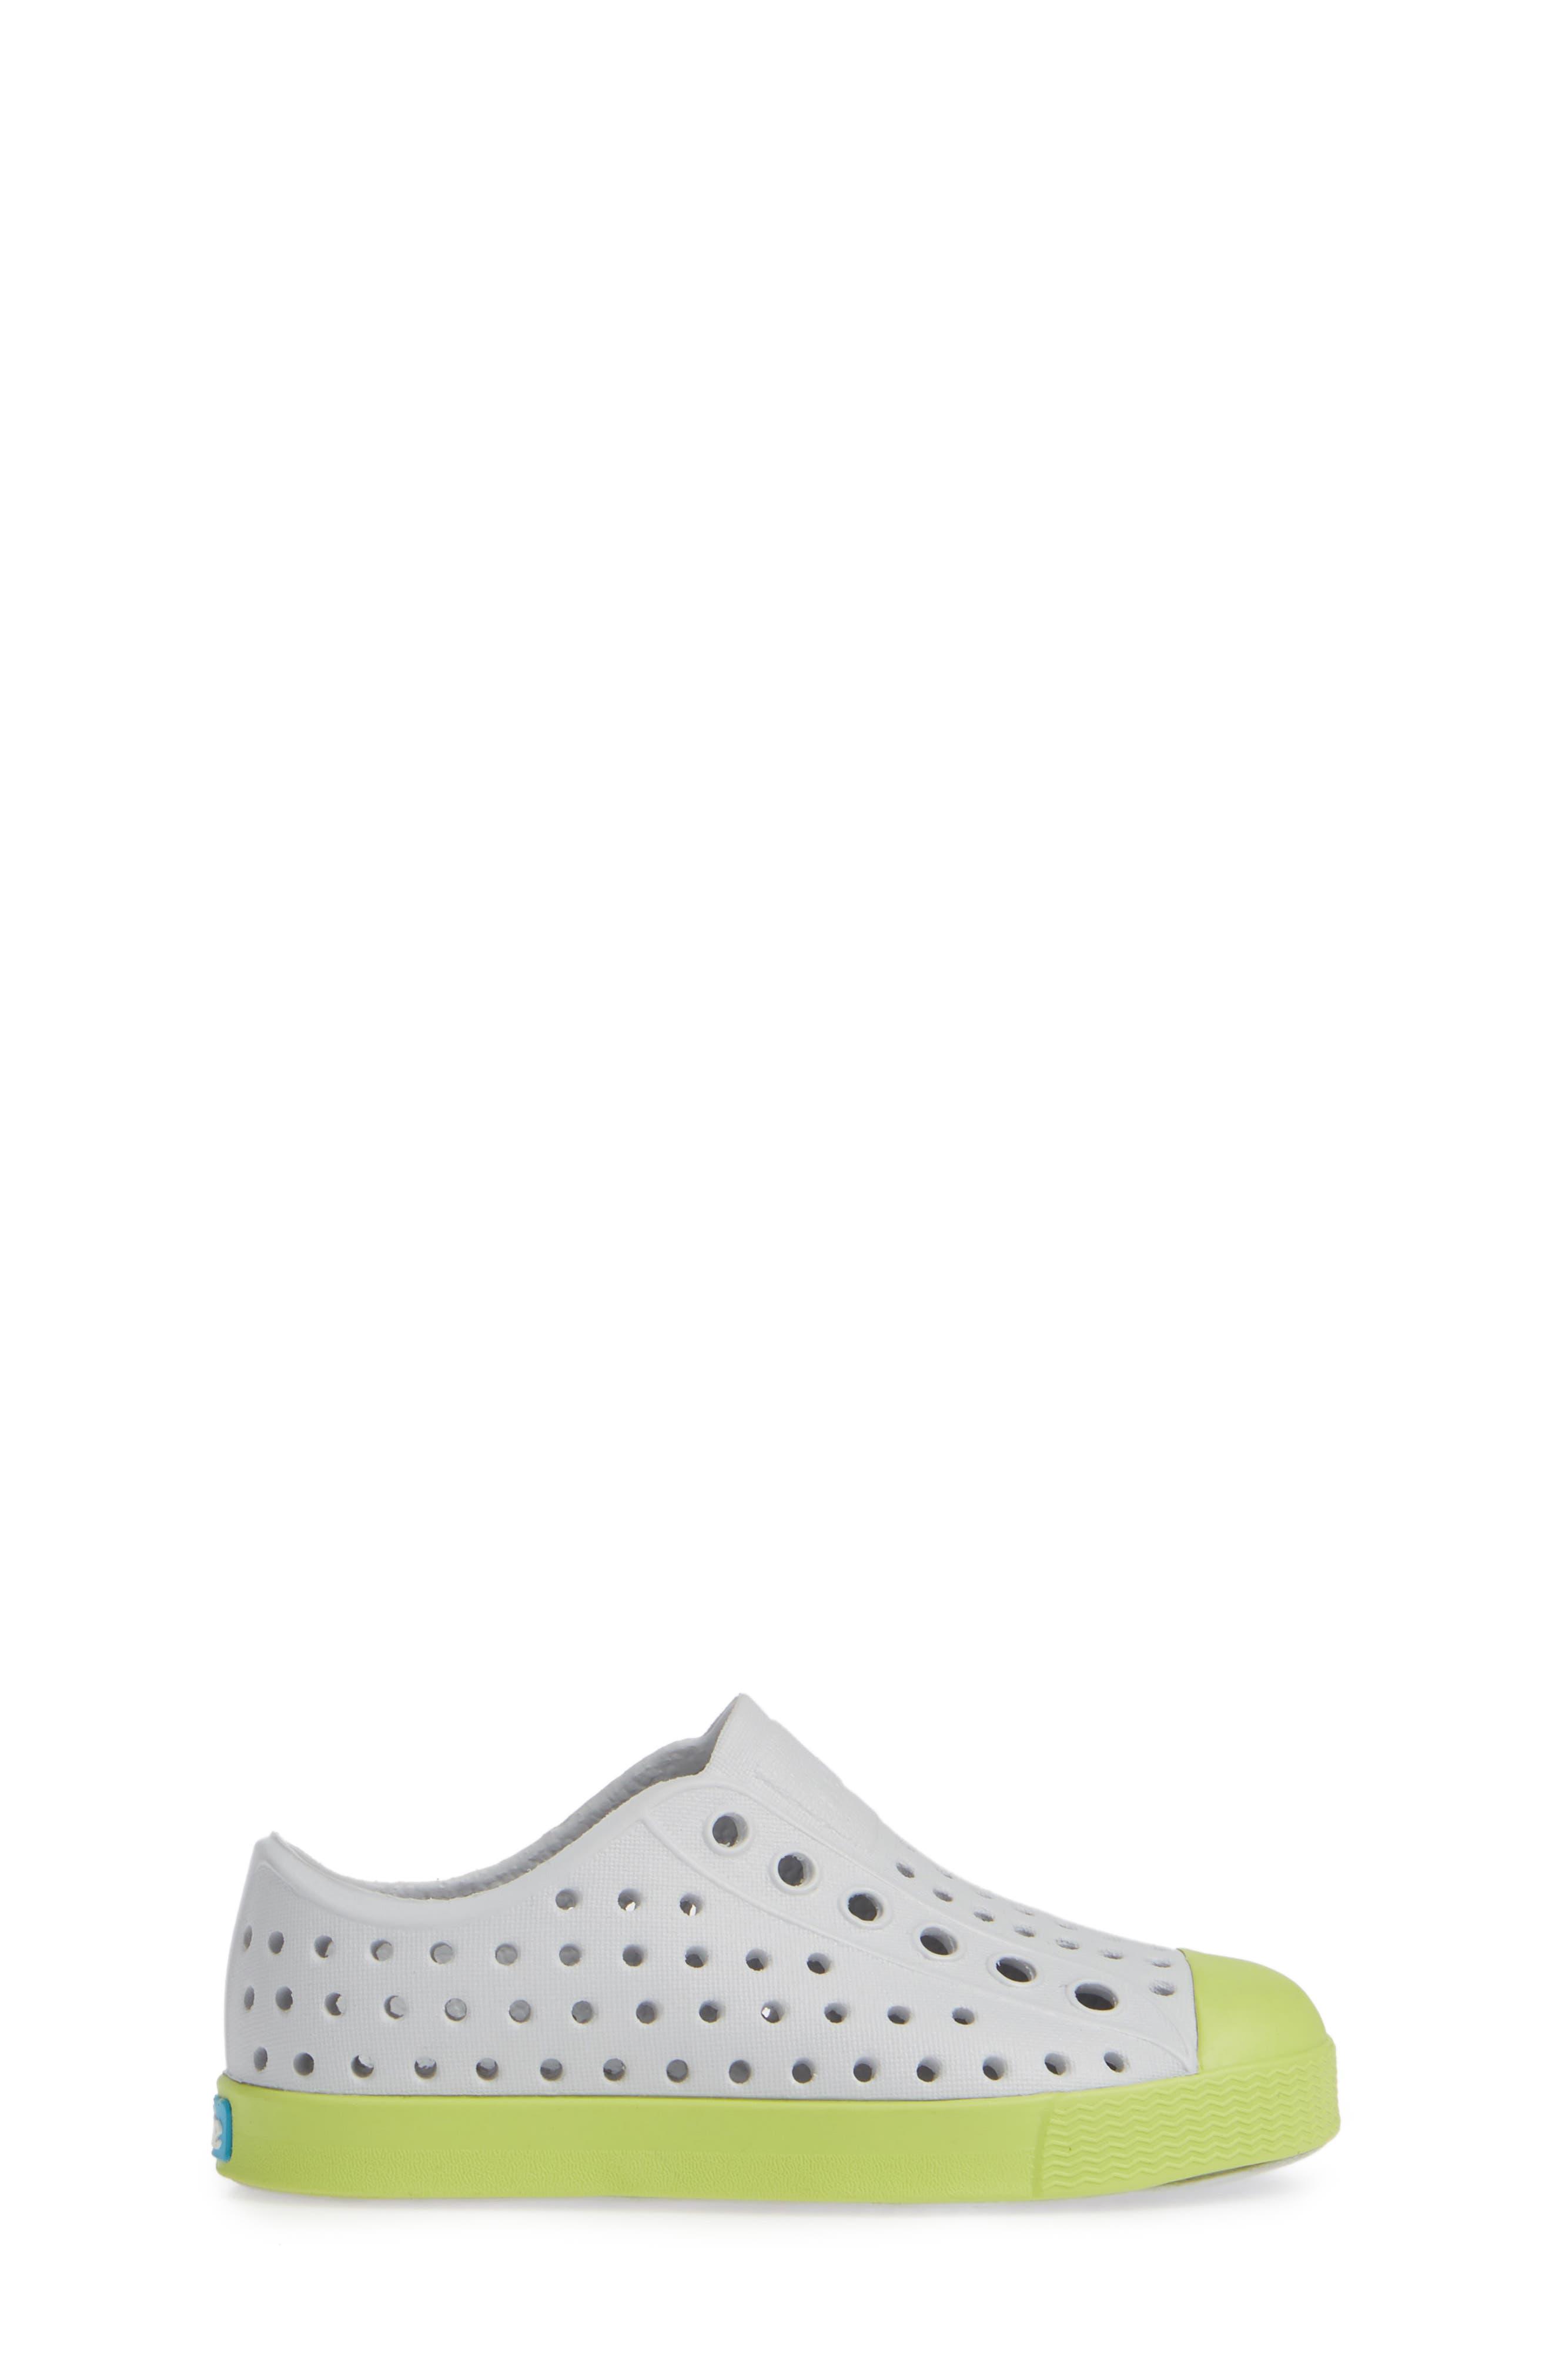 'Jefferson' Water Friendly Slip-On Sneaker,                             Alternate thumbnail 123, color,